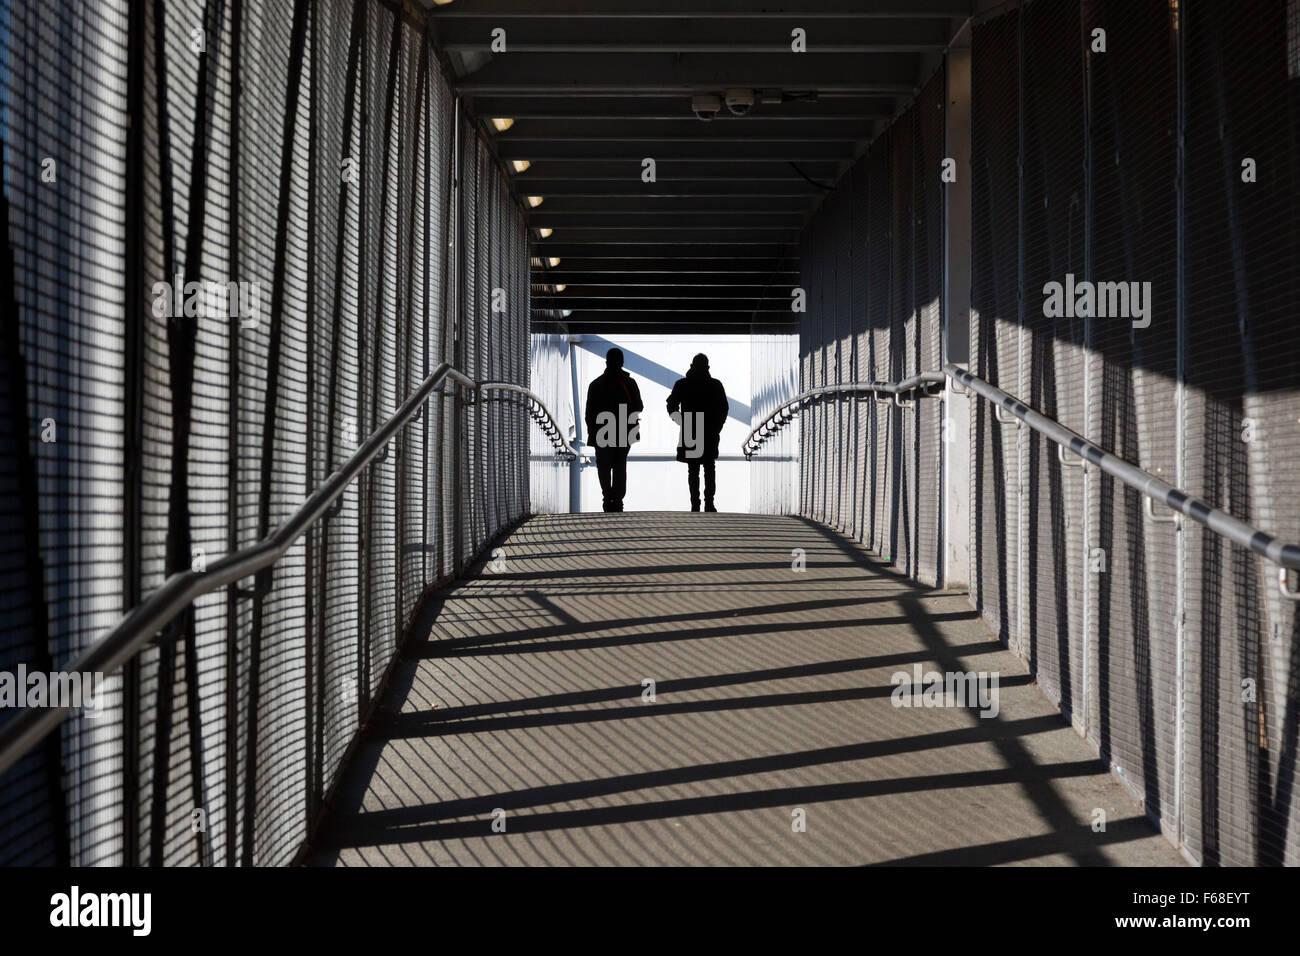 people-crossing-bridge-over-the-railway-feltham-middlesex-F68EYT.jpg